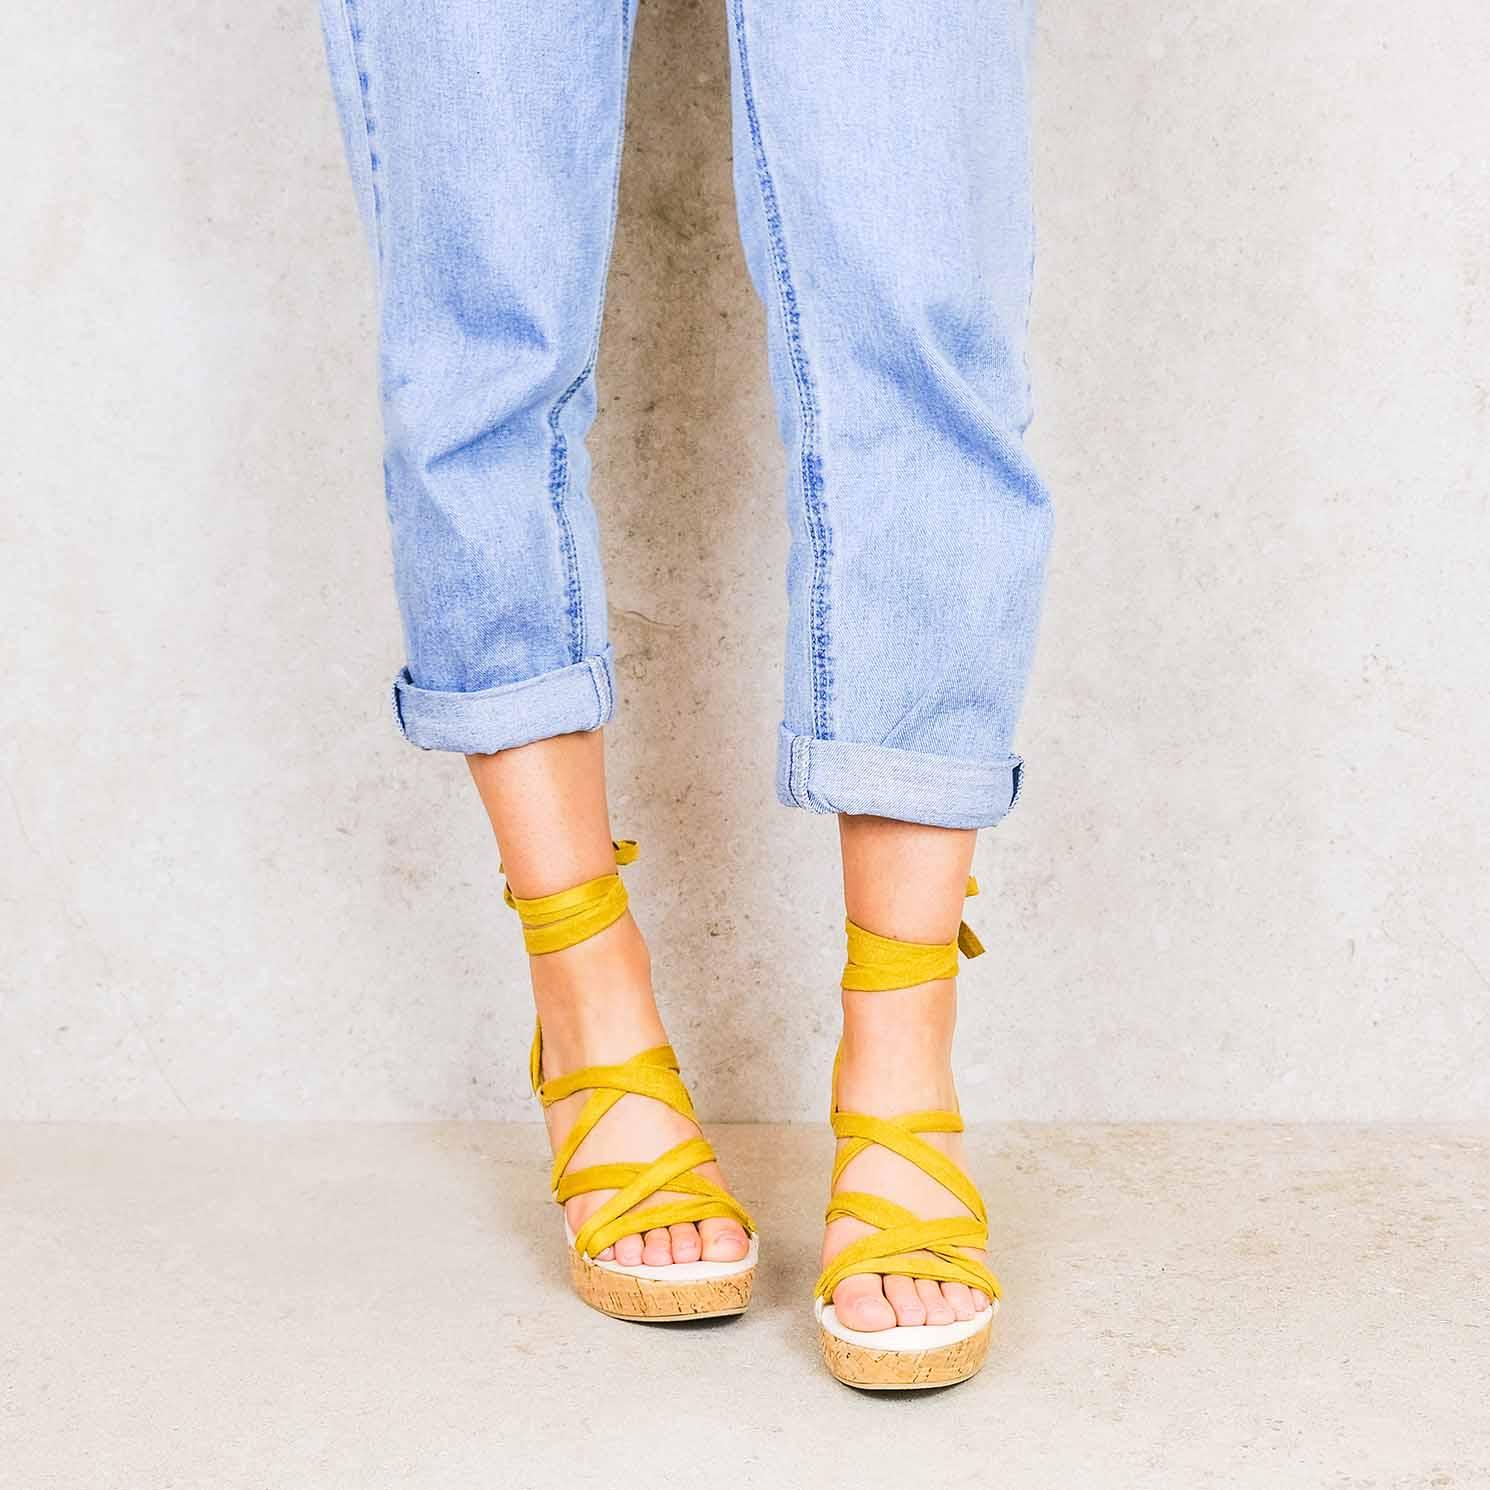 Mustard-suede ribbons linten lintsandalen sandals travelsandals vegan sustainable sandals wikkelsandalen